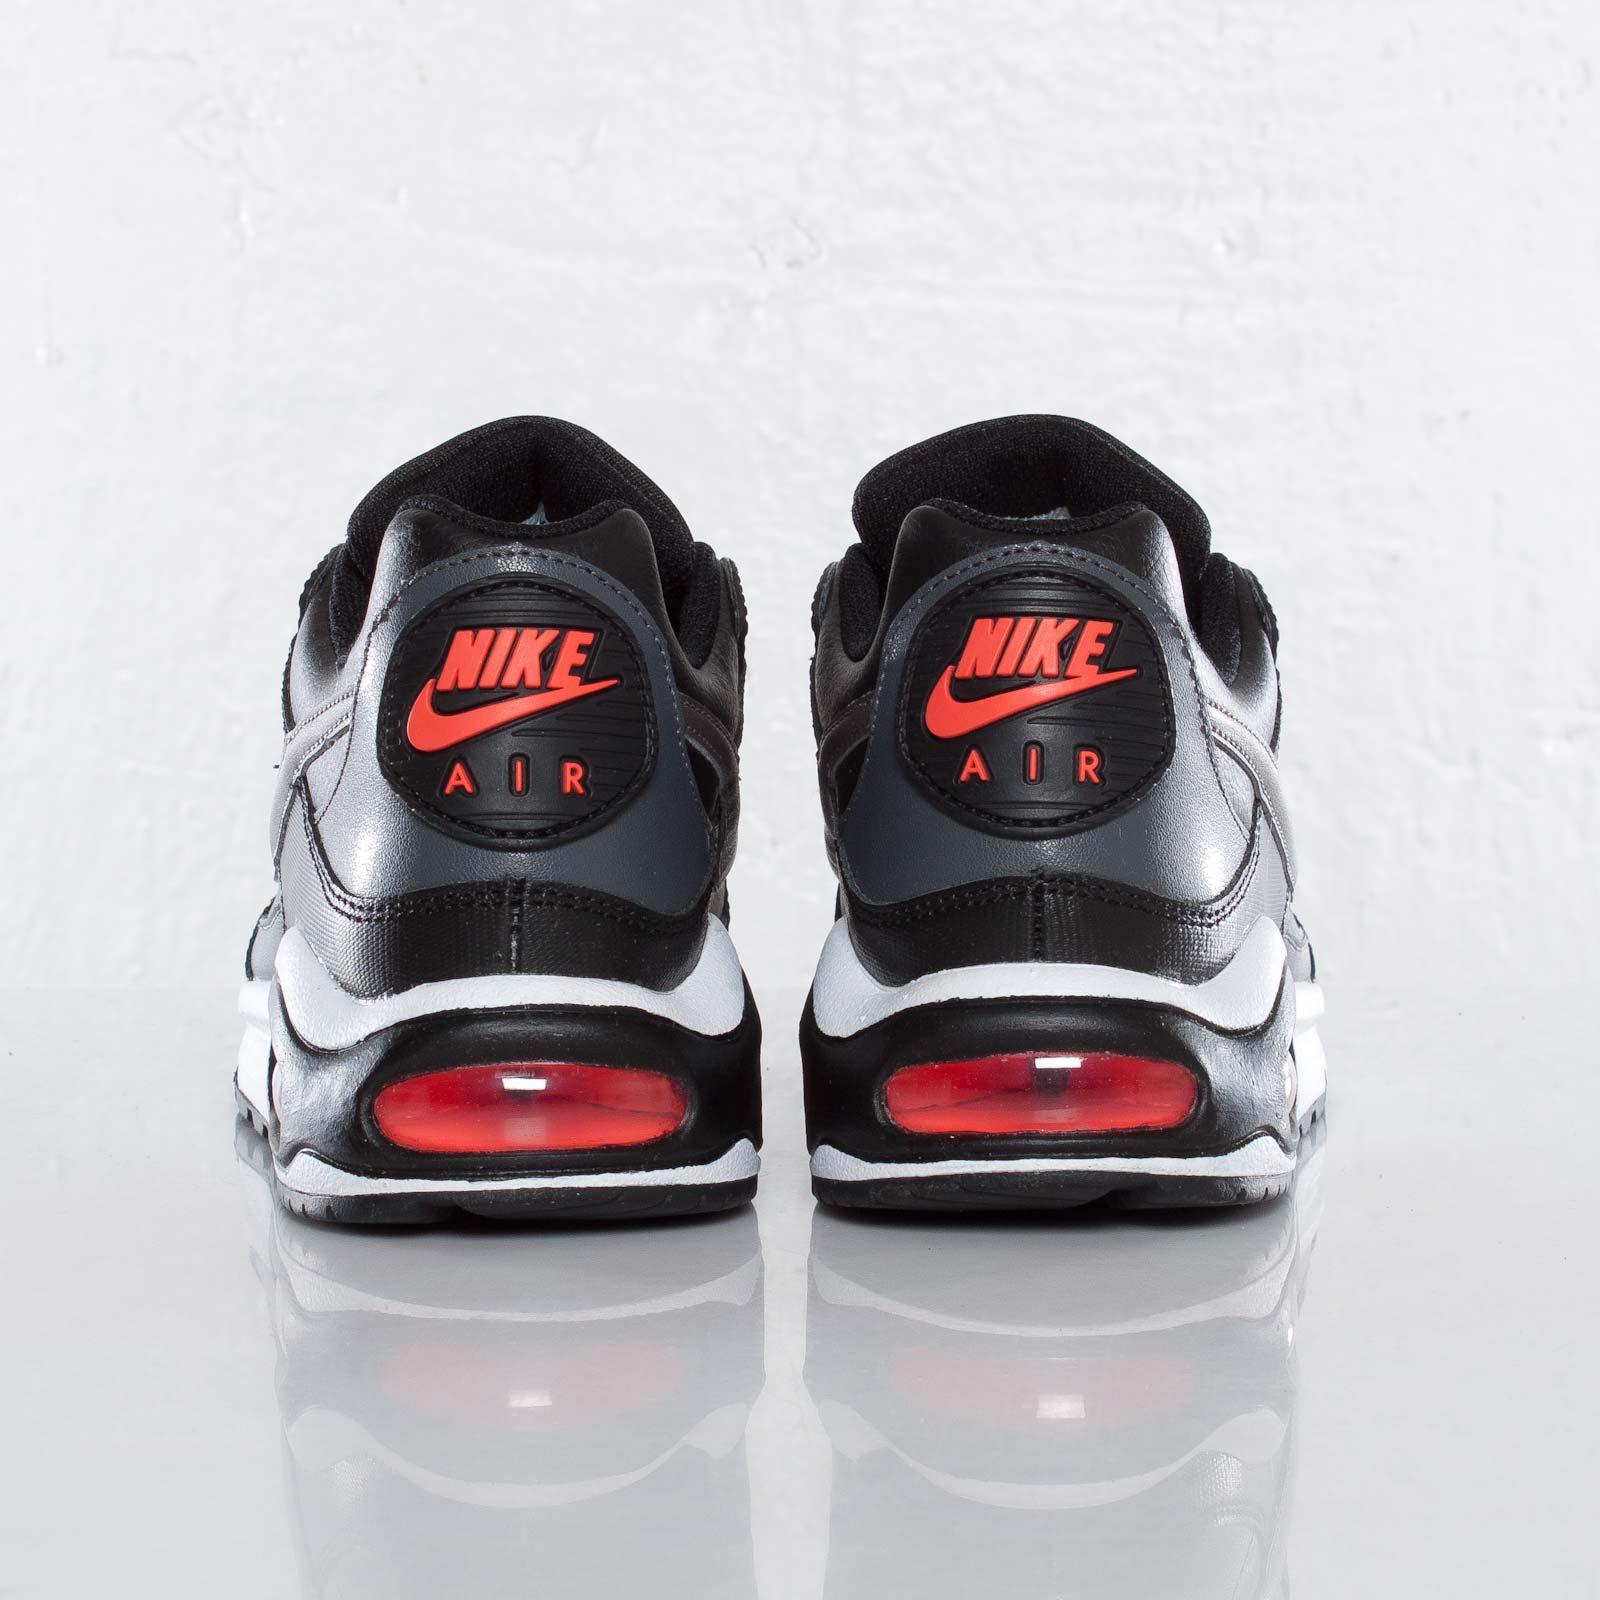 new arrival d93d9 6df62 Nike Air Max Skyline (GS) - 366826-023 - Sneakersnstuff   sneakers    streetwear online since 1999